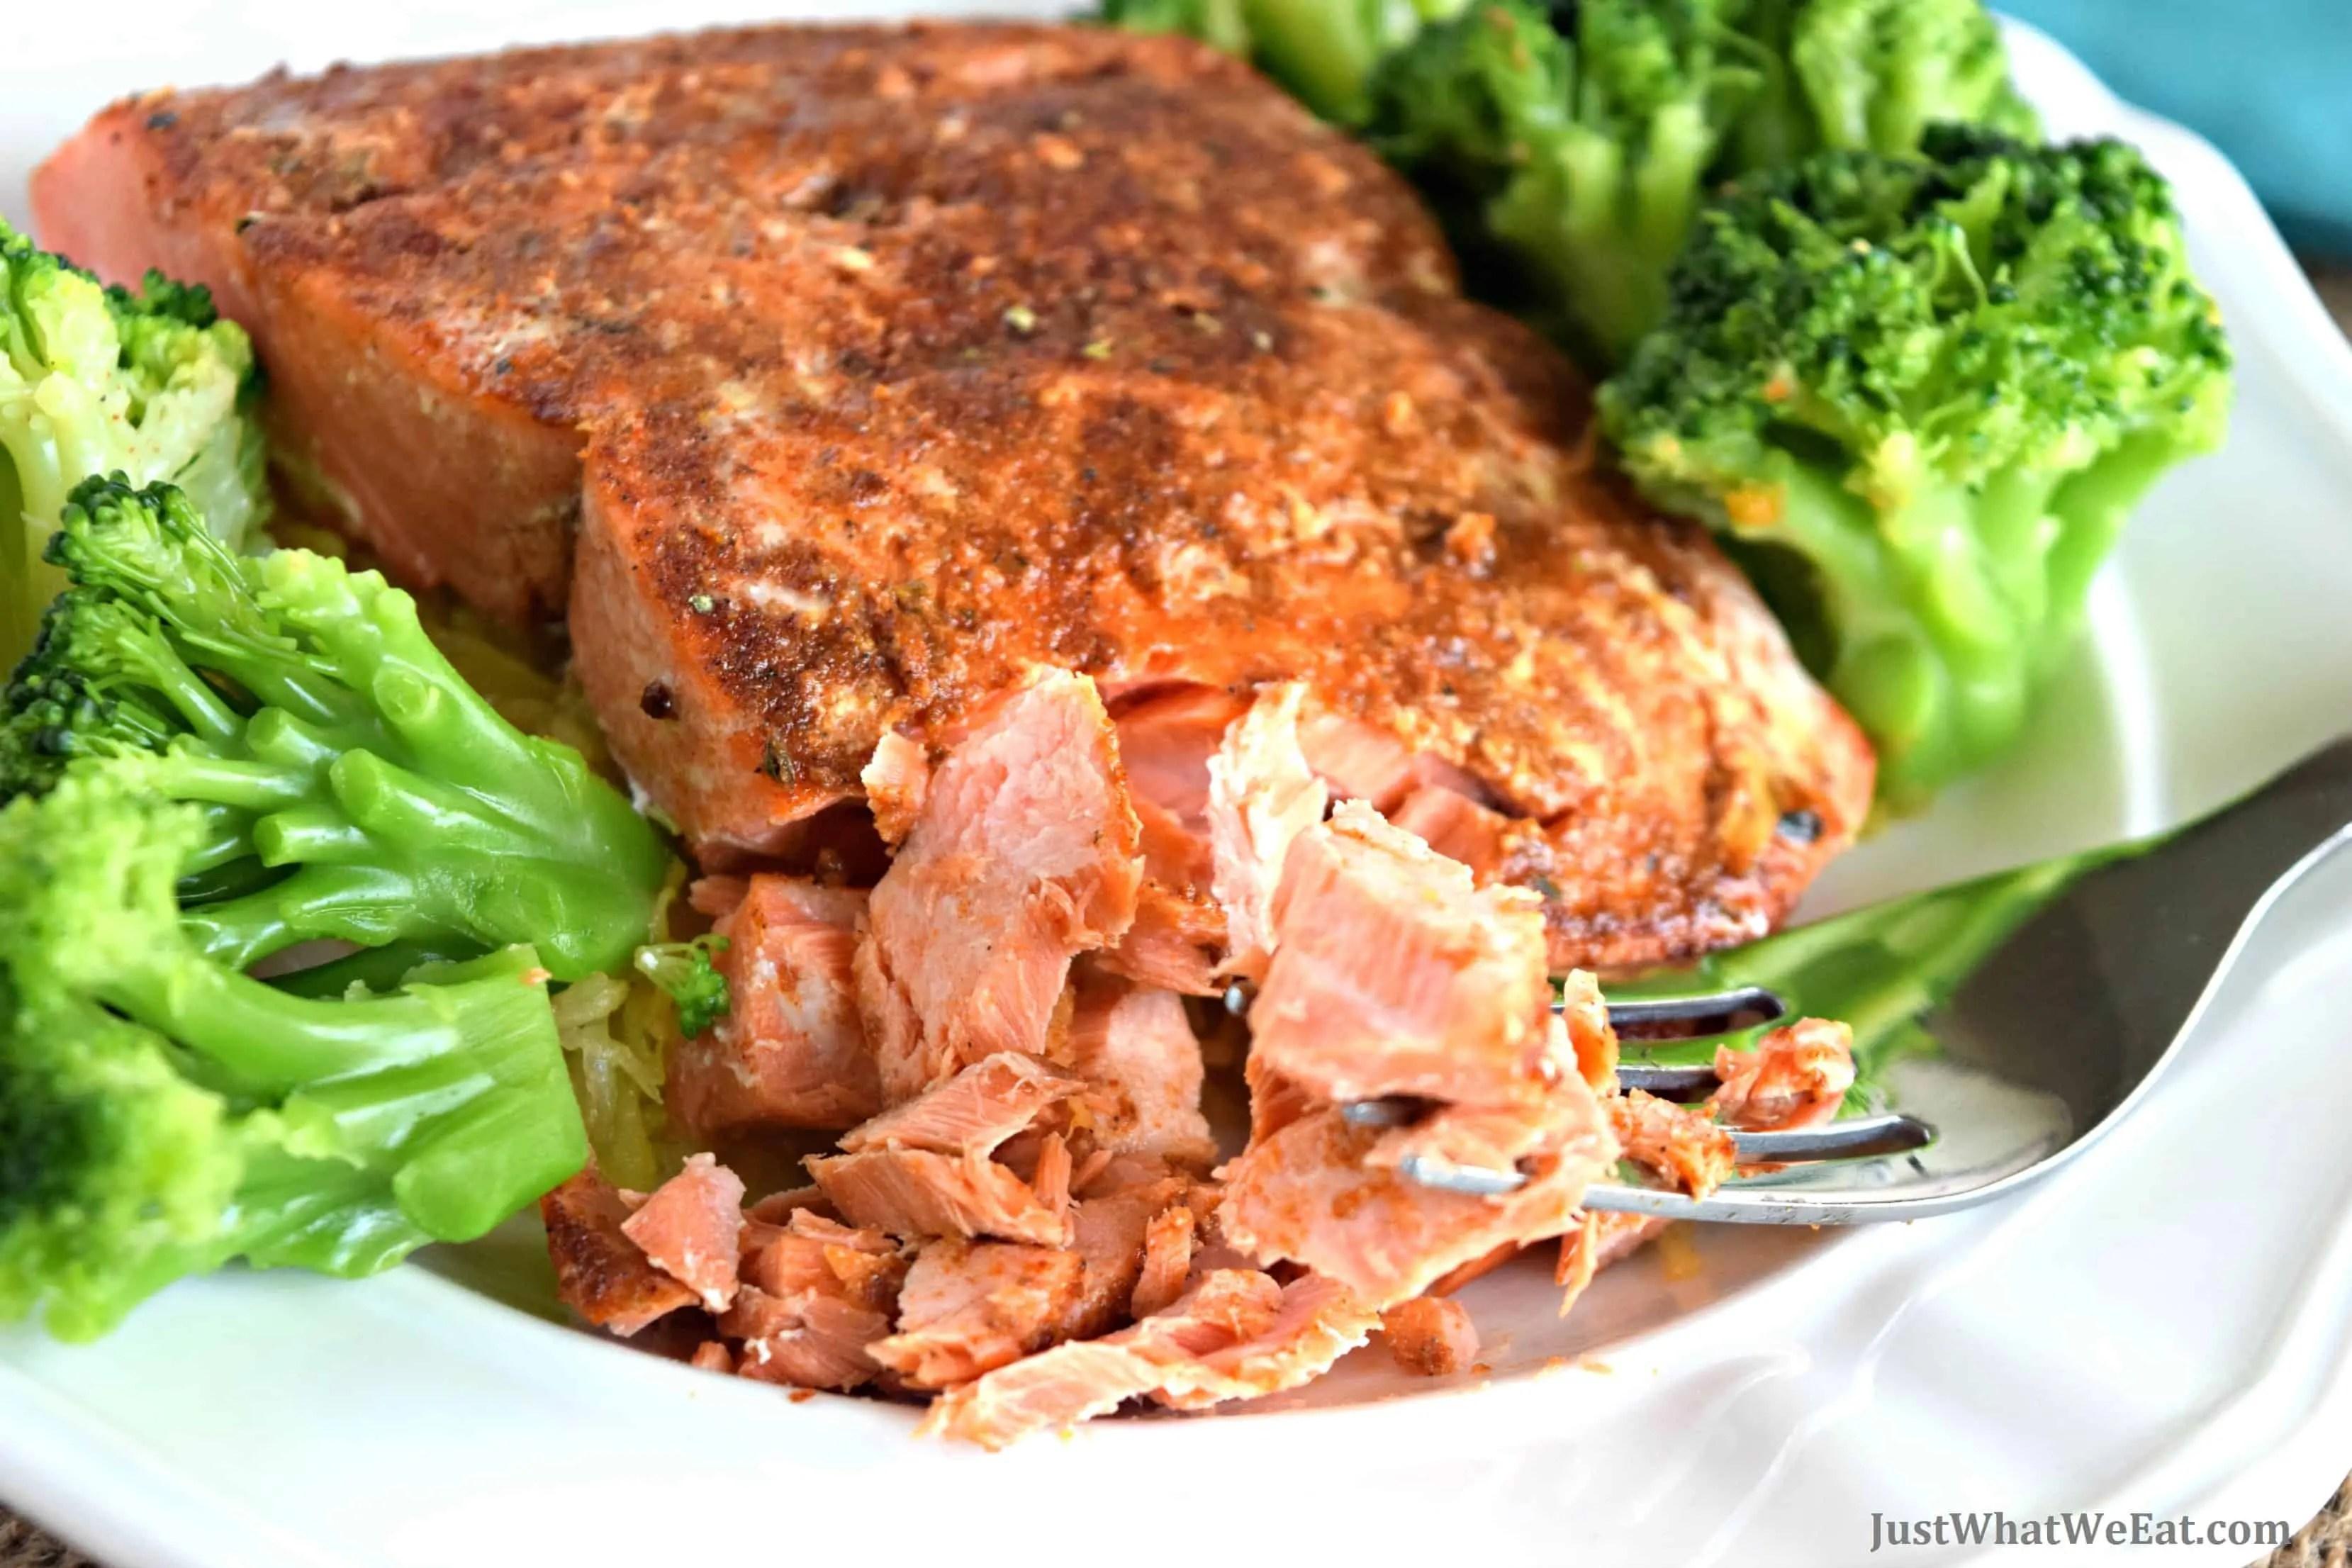 BBQ Baked Salmon - Gluten Free & Dairy Free